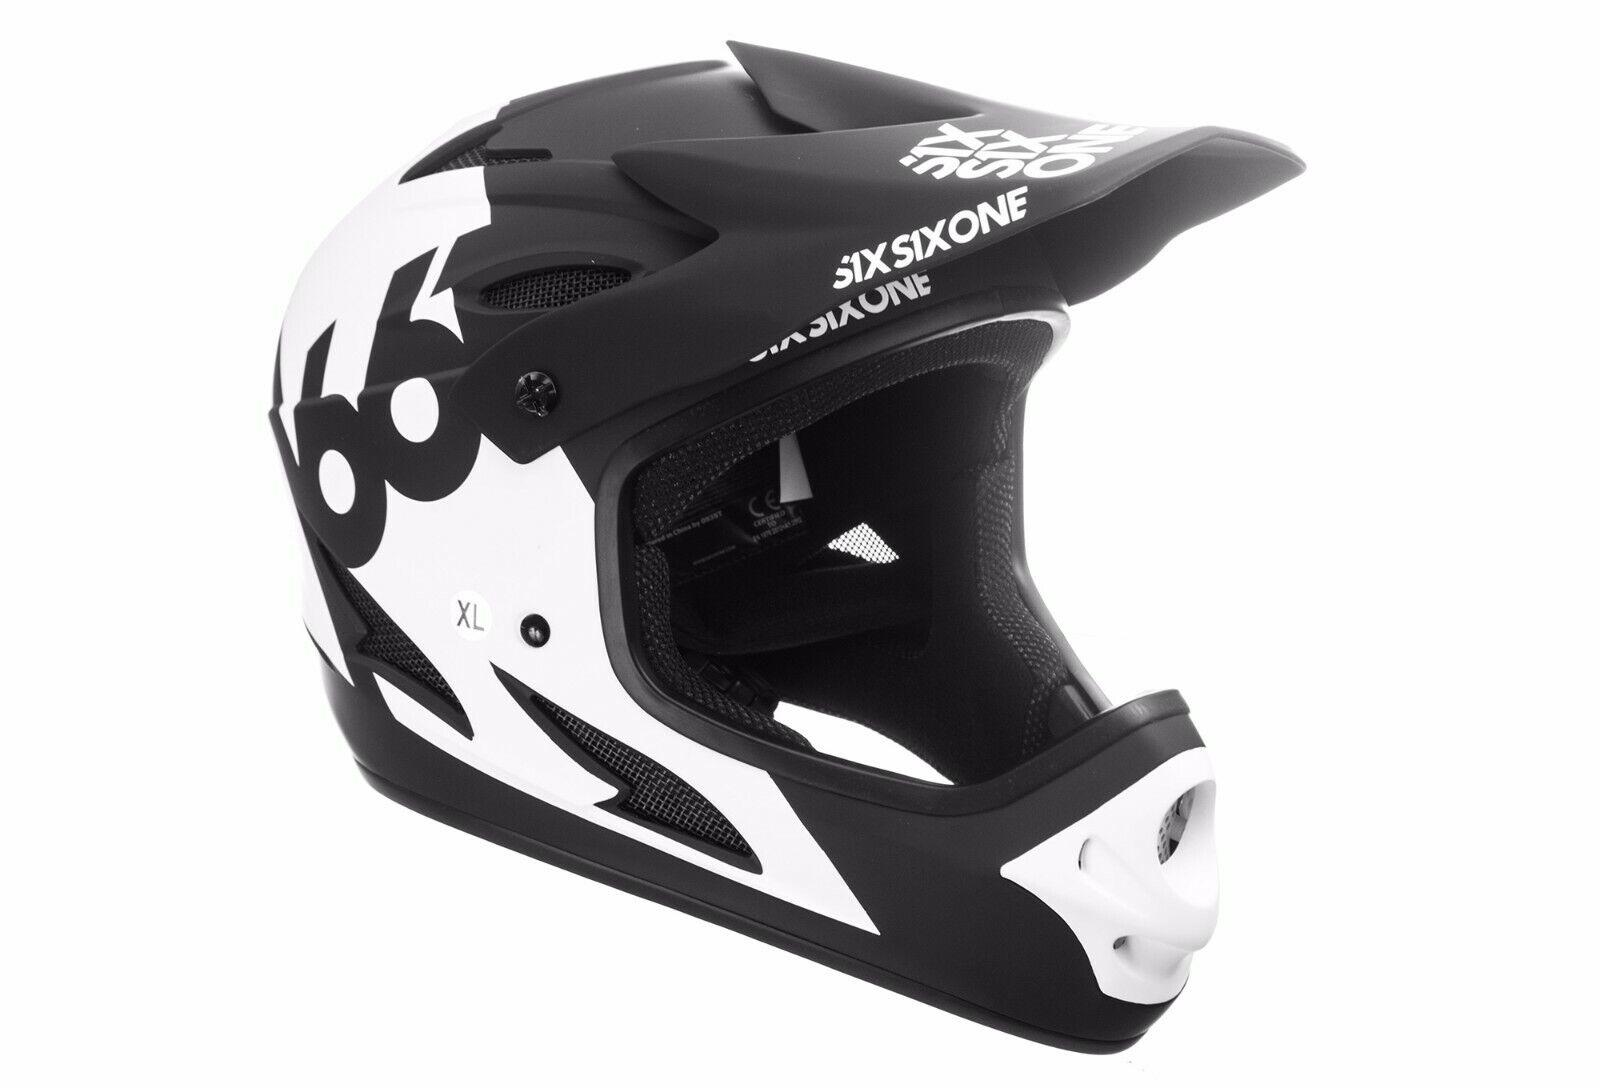 SixSixOne 661  Comp  Full Face MTB Mountain Bike  BMX Helmet  Matt bianca